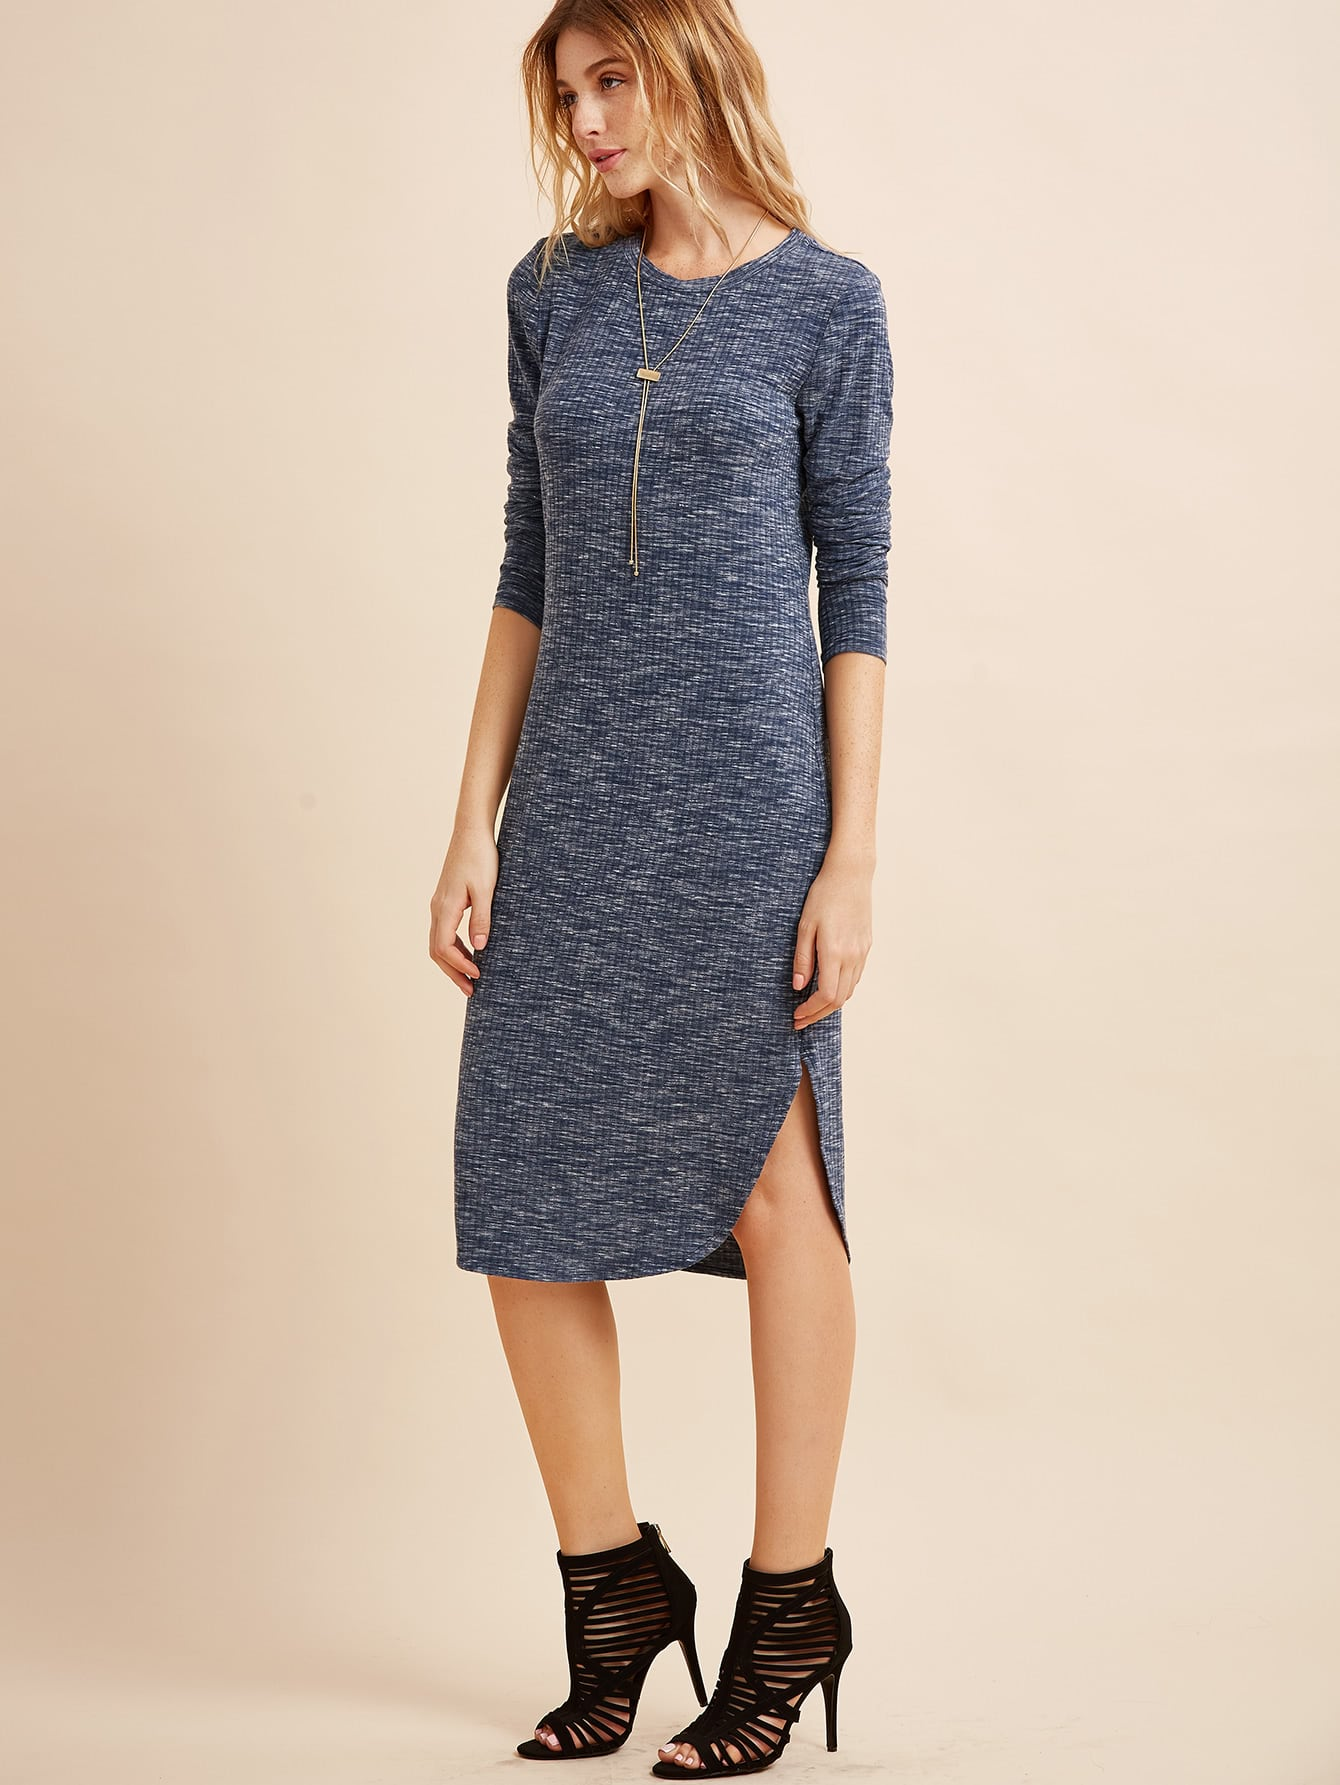 Navy Marled Knit Curved Hem Ribbed Dress dress160927706